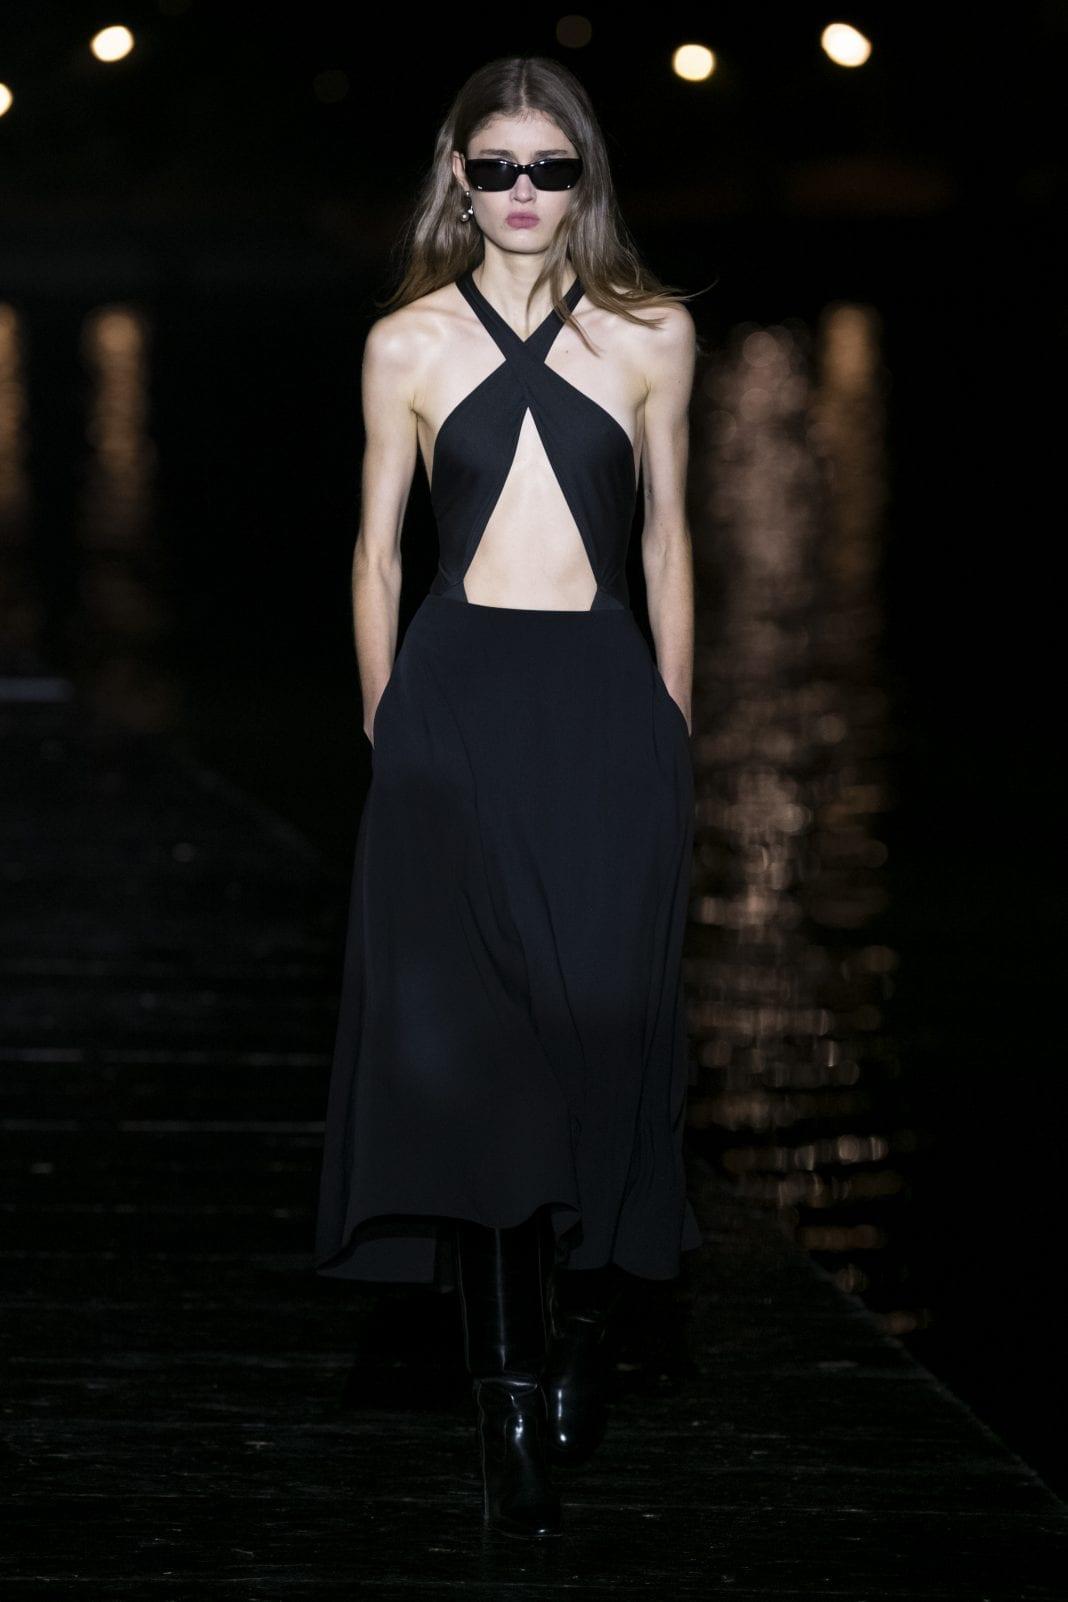 All time classic: Αυτά είναι τα ωραιότερα μαύρα φορέματα του καλοκαιριού